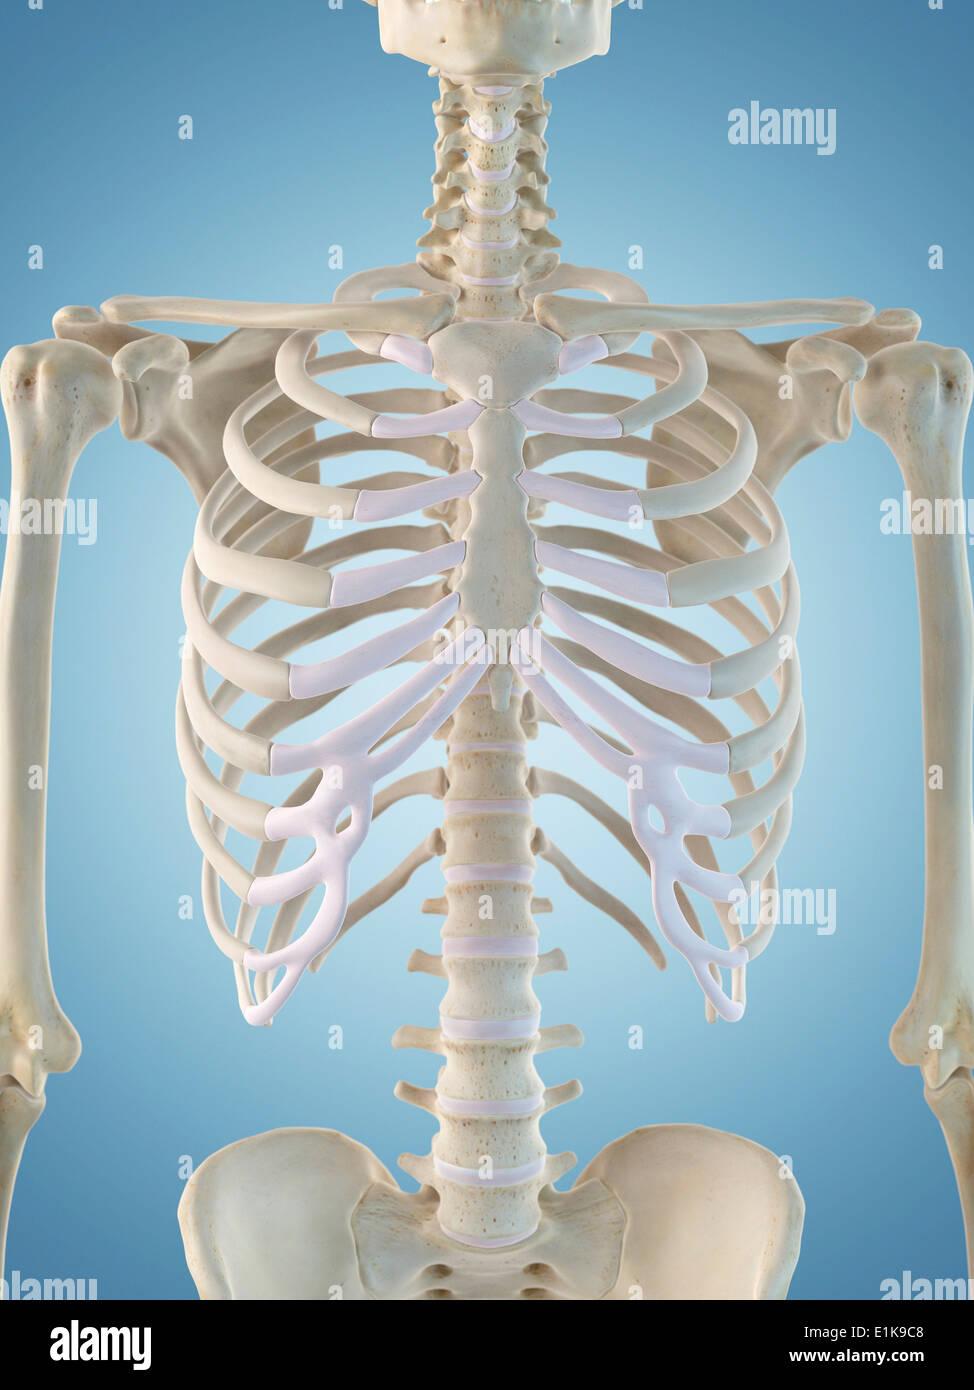 Human Skeletal Structure Computer Artwork Stock Photo 69880616 Alamy